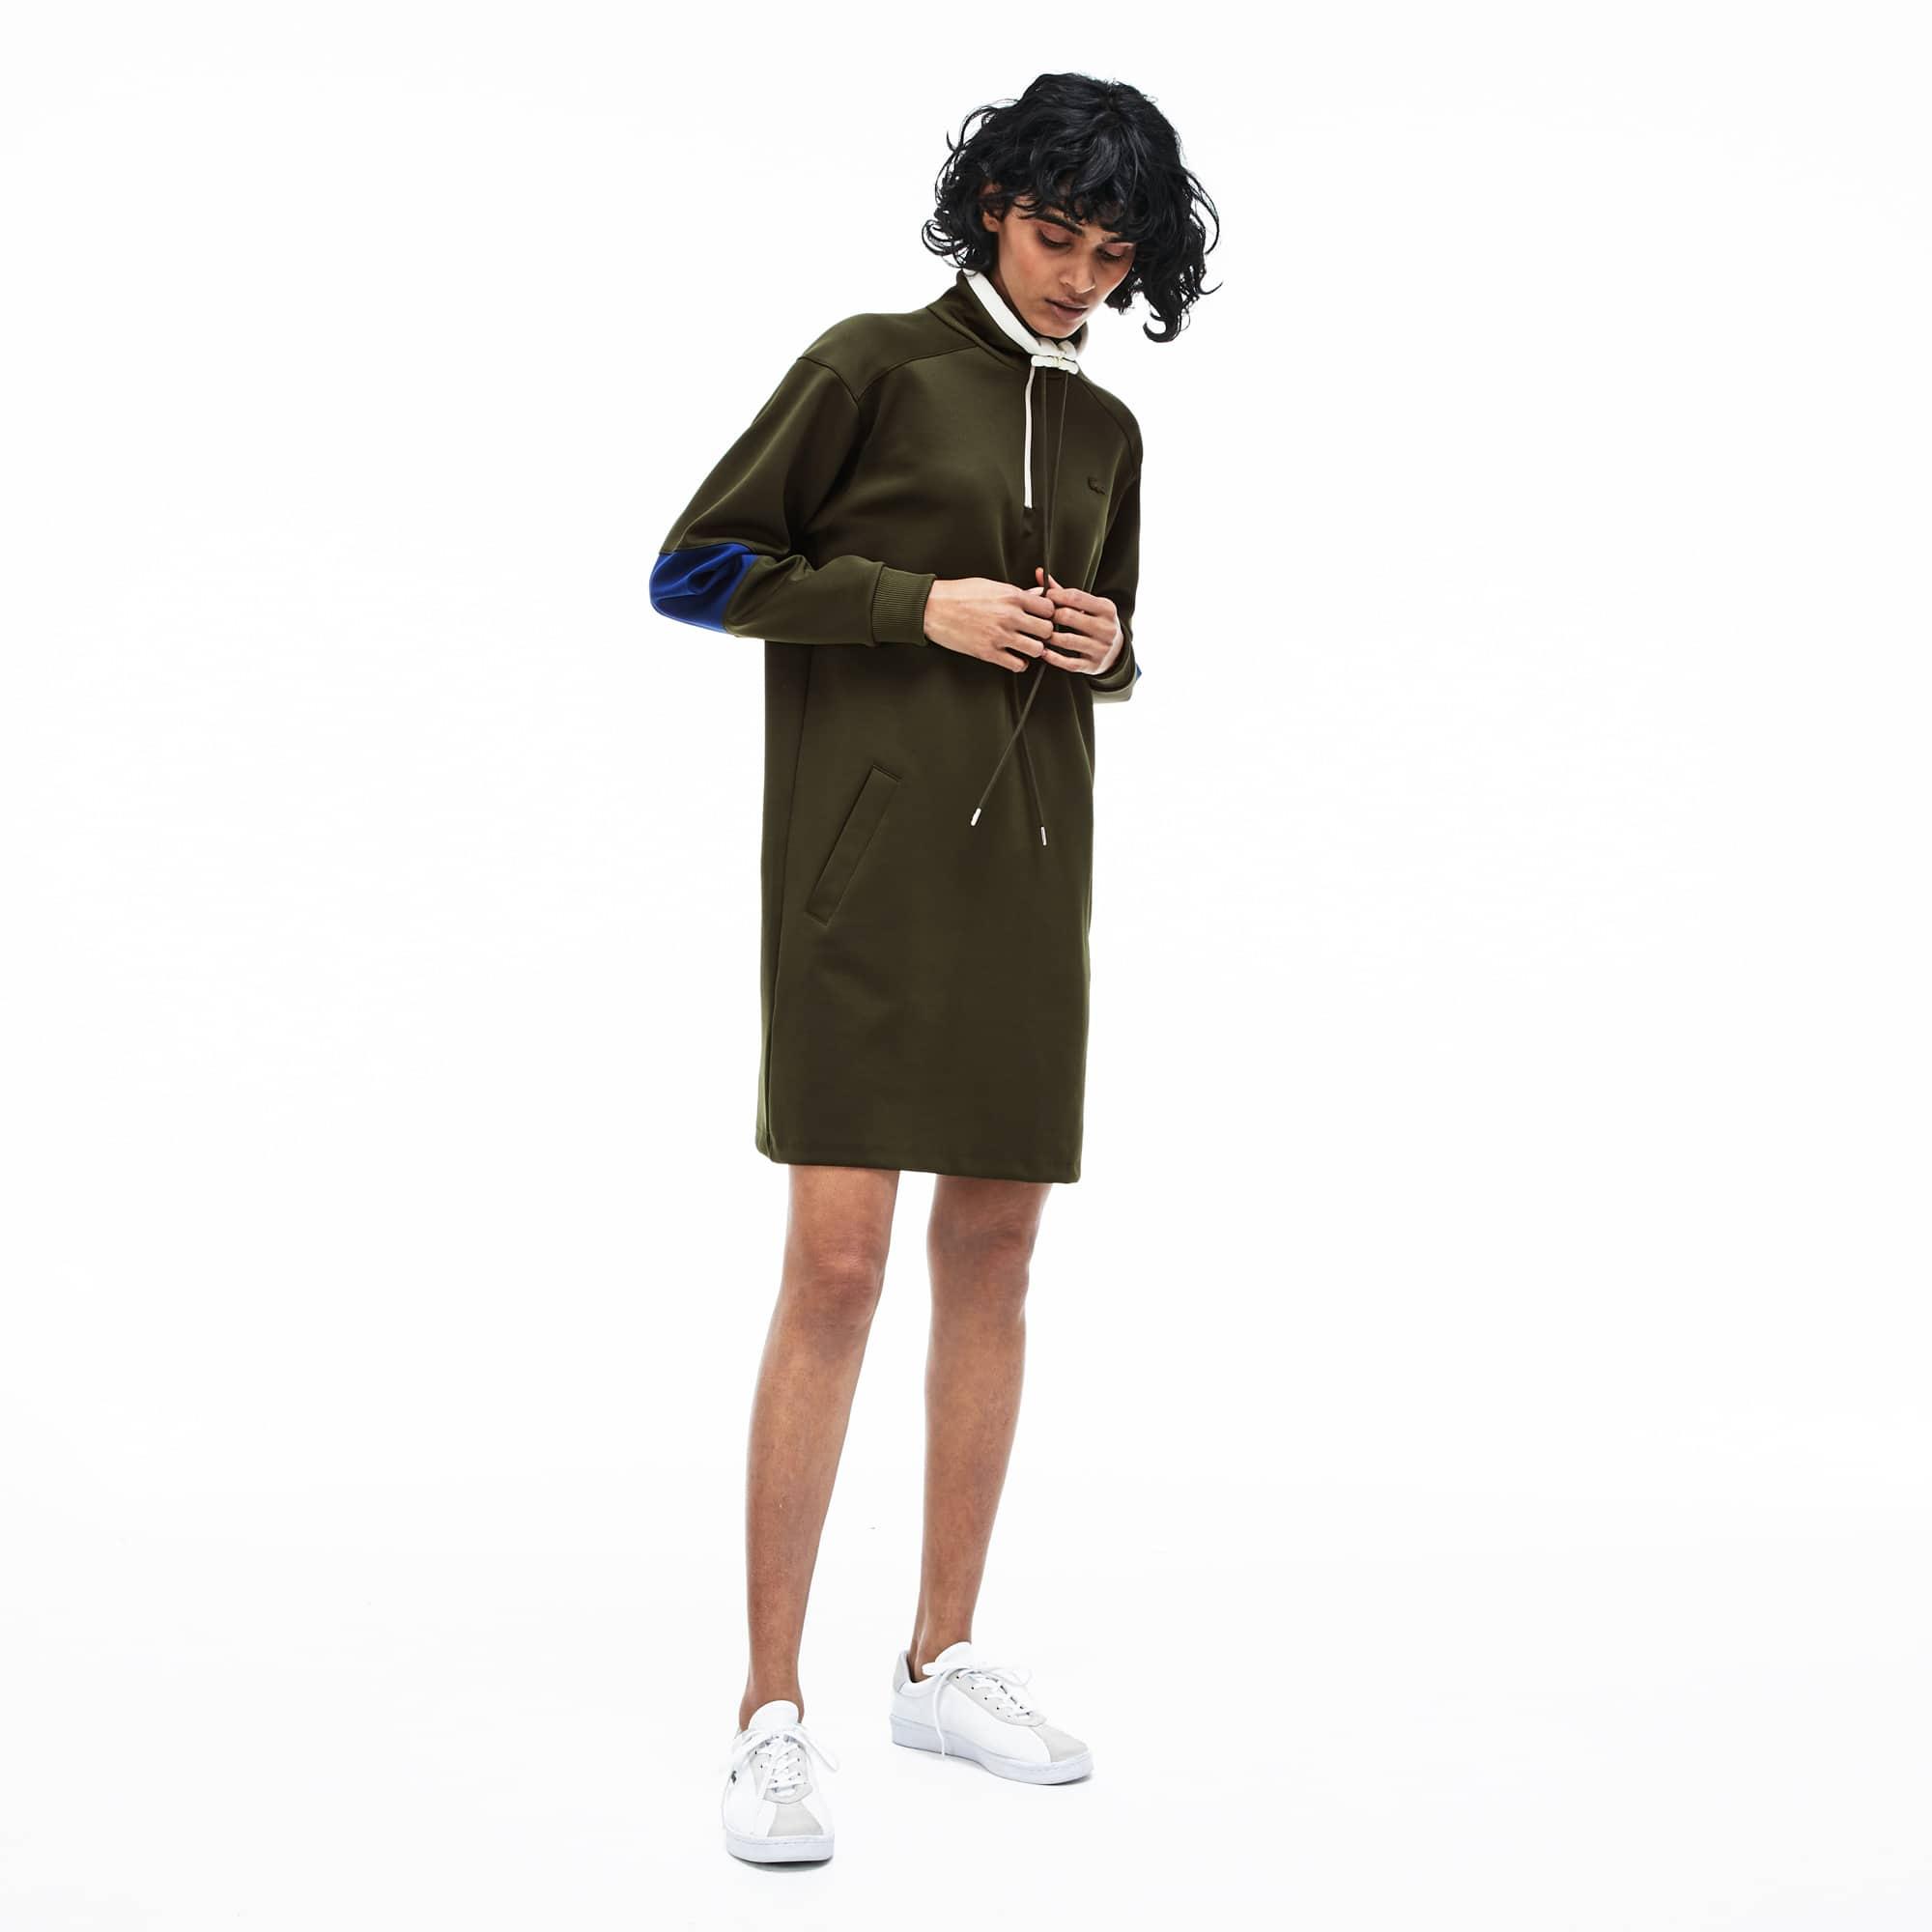 Women's Neoprene Sweatshirt Dress